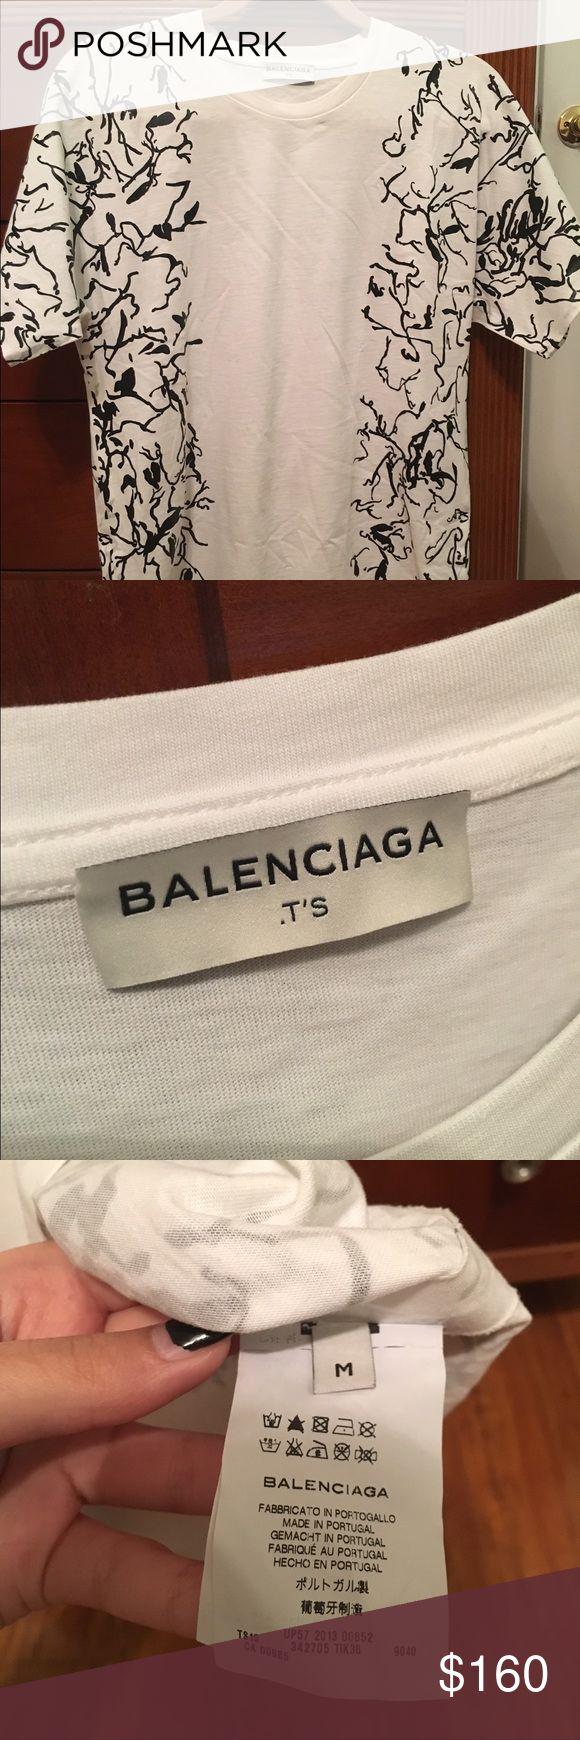 BALENCIAGA shirt NEVER WORN, comes with all tags, perfect condition Balenciaga Tops Tees - Short Sleeve